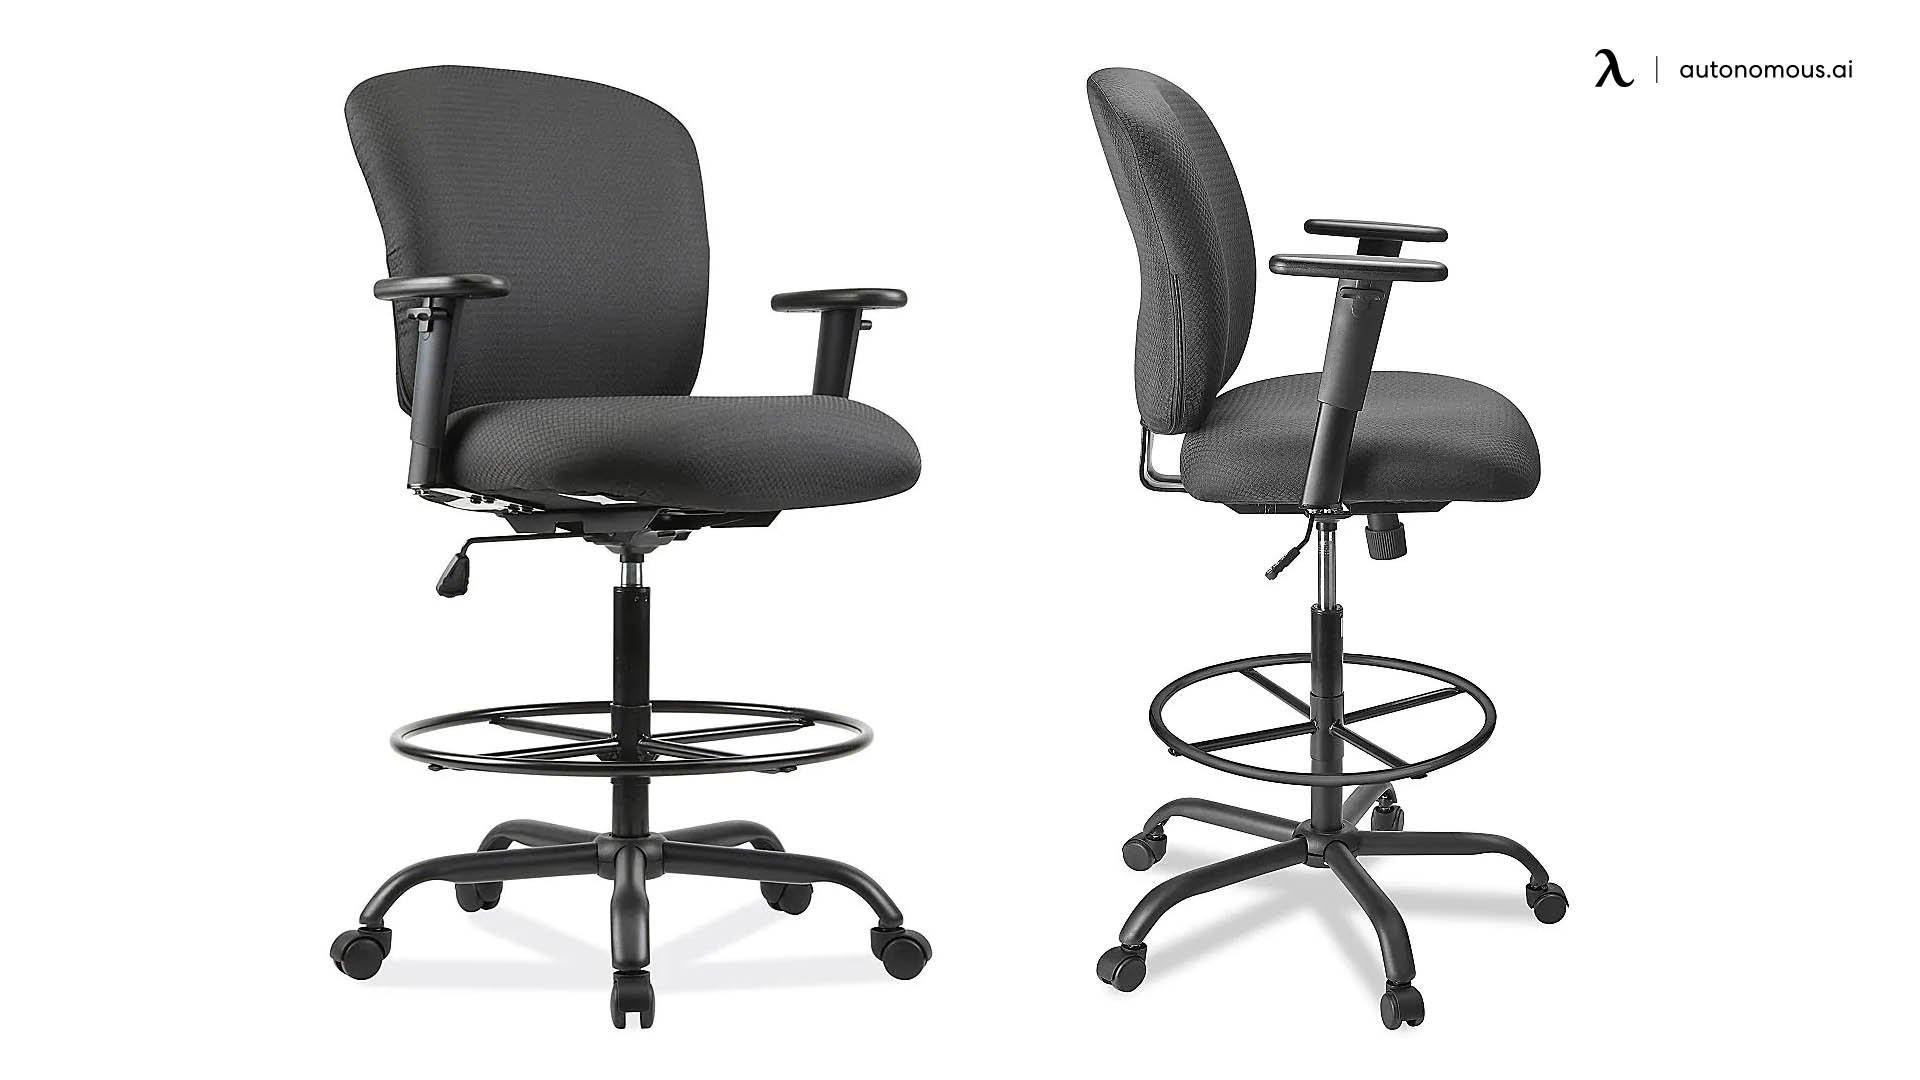 Uline Big and Tall work stool